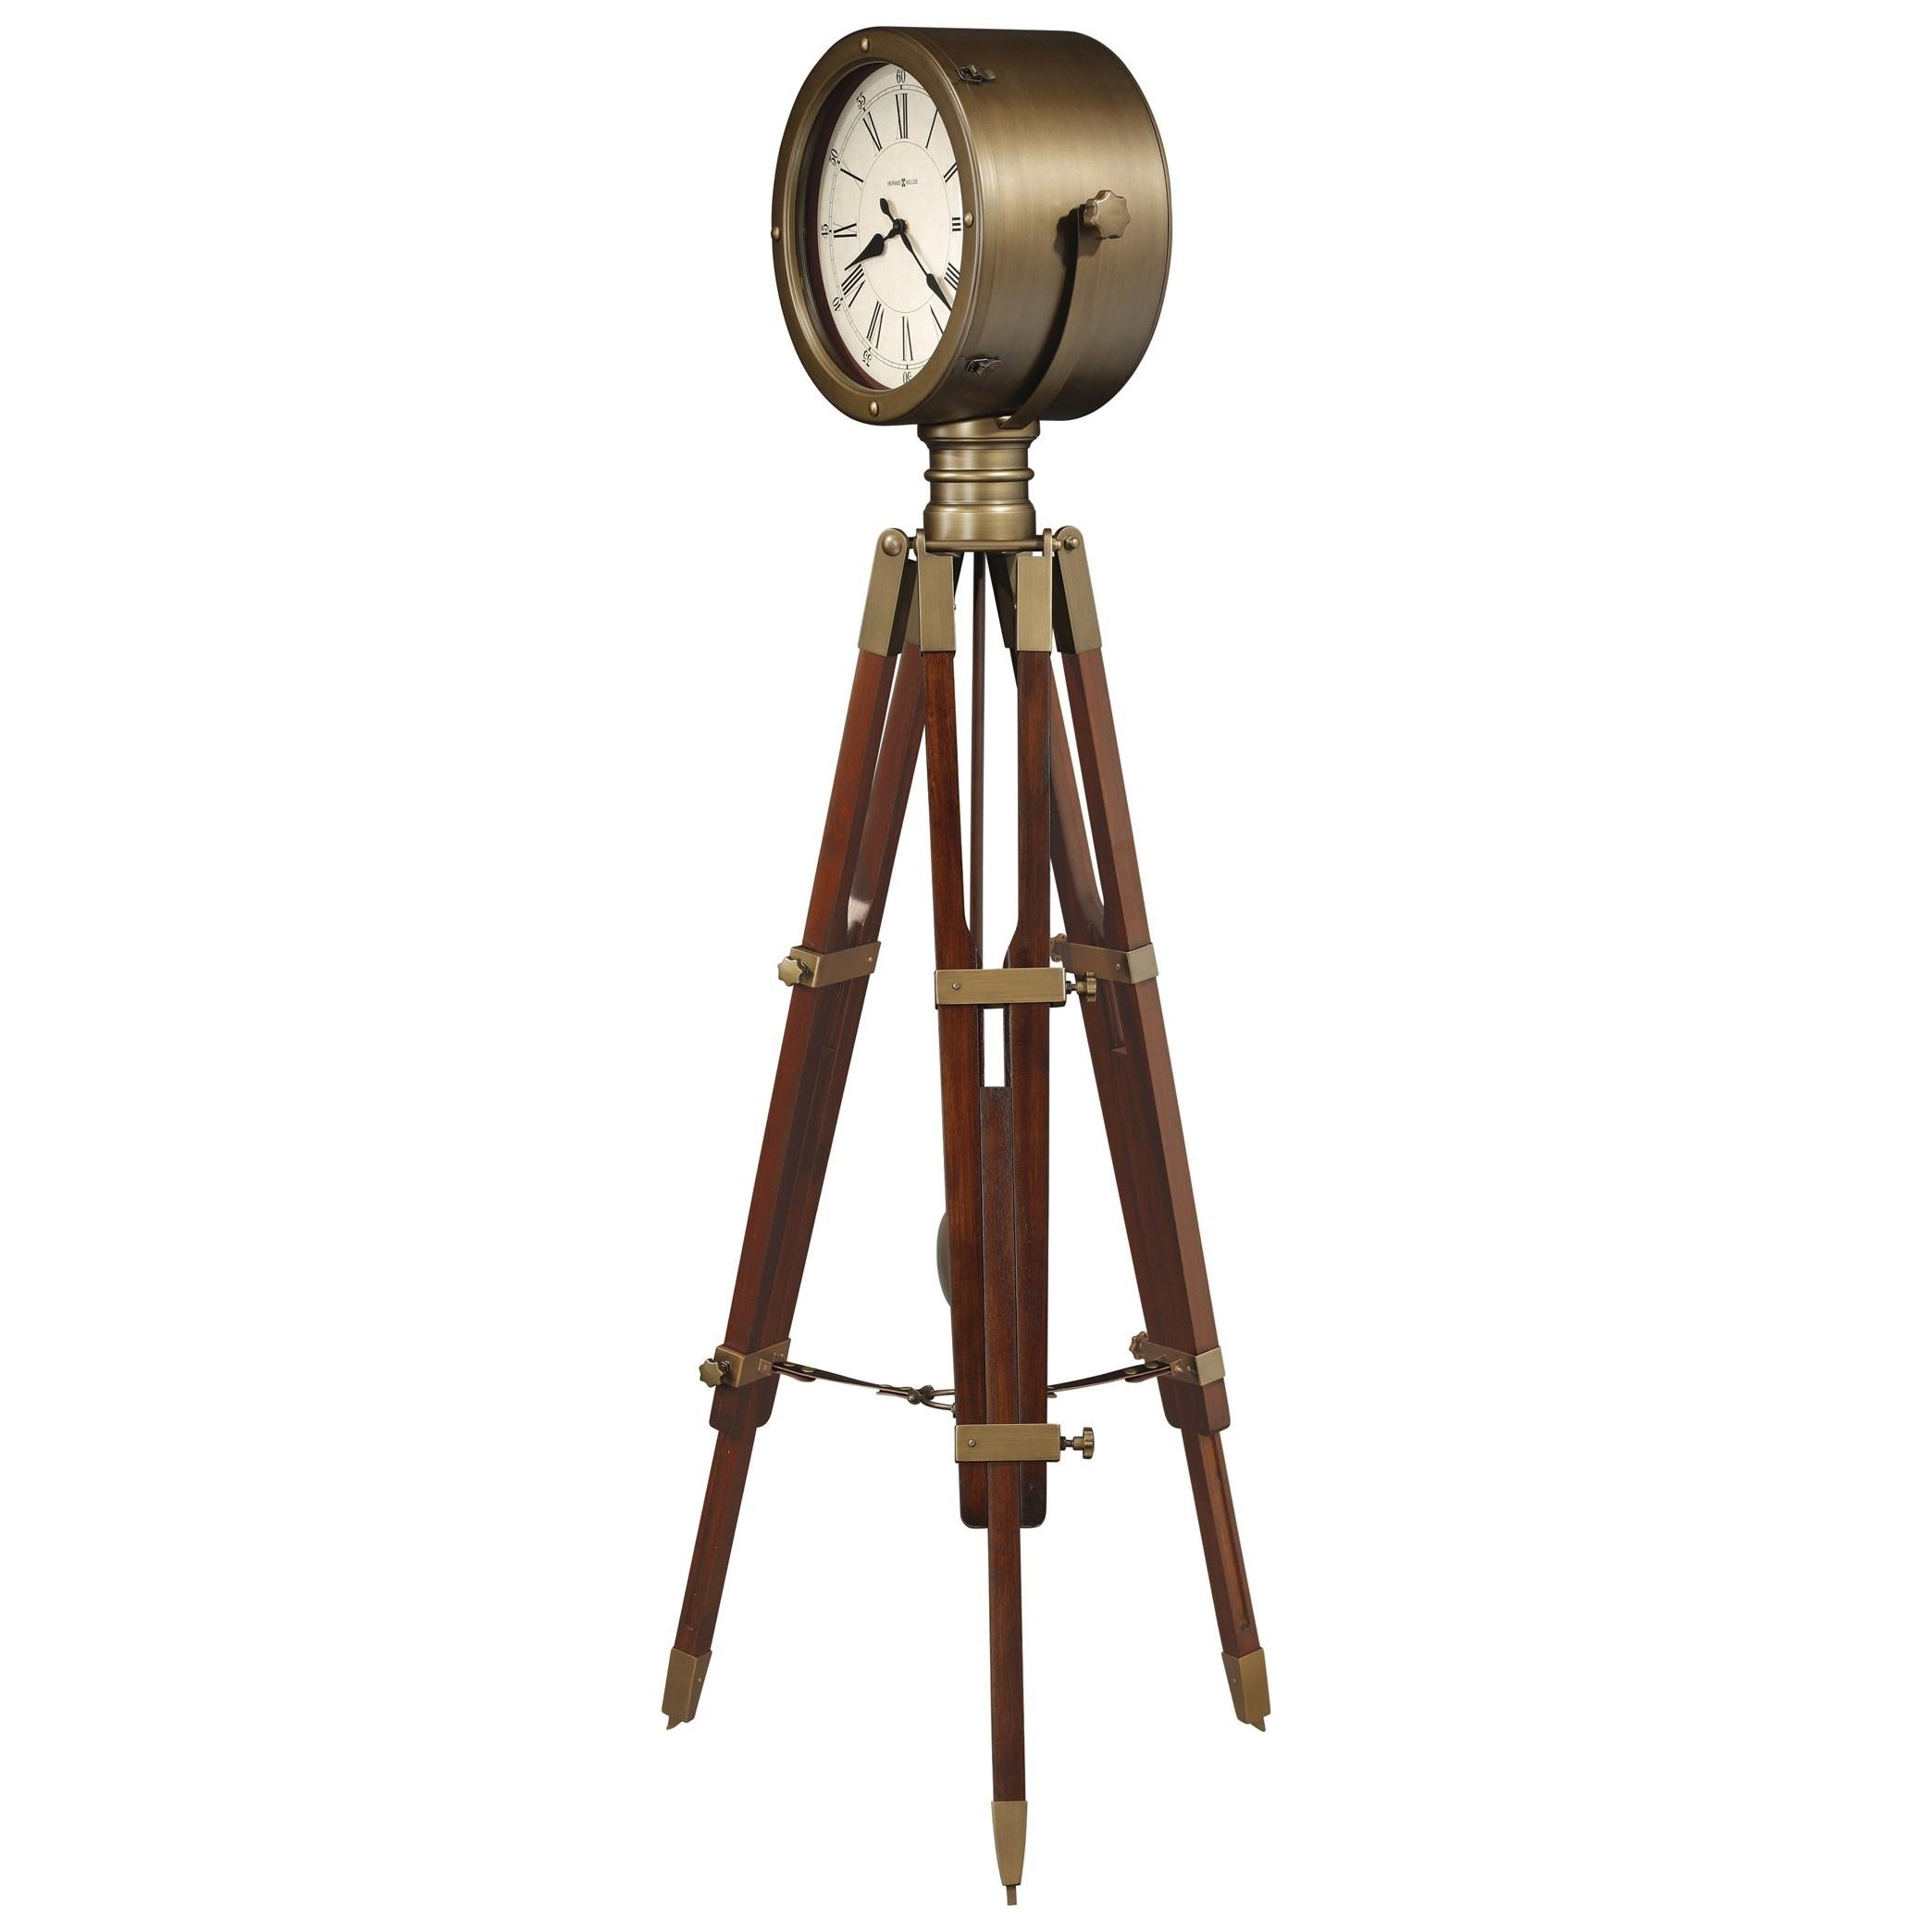 Howard Miller Clocks 615 080 Time Surveyor Tripod Floor